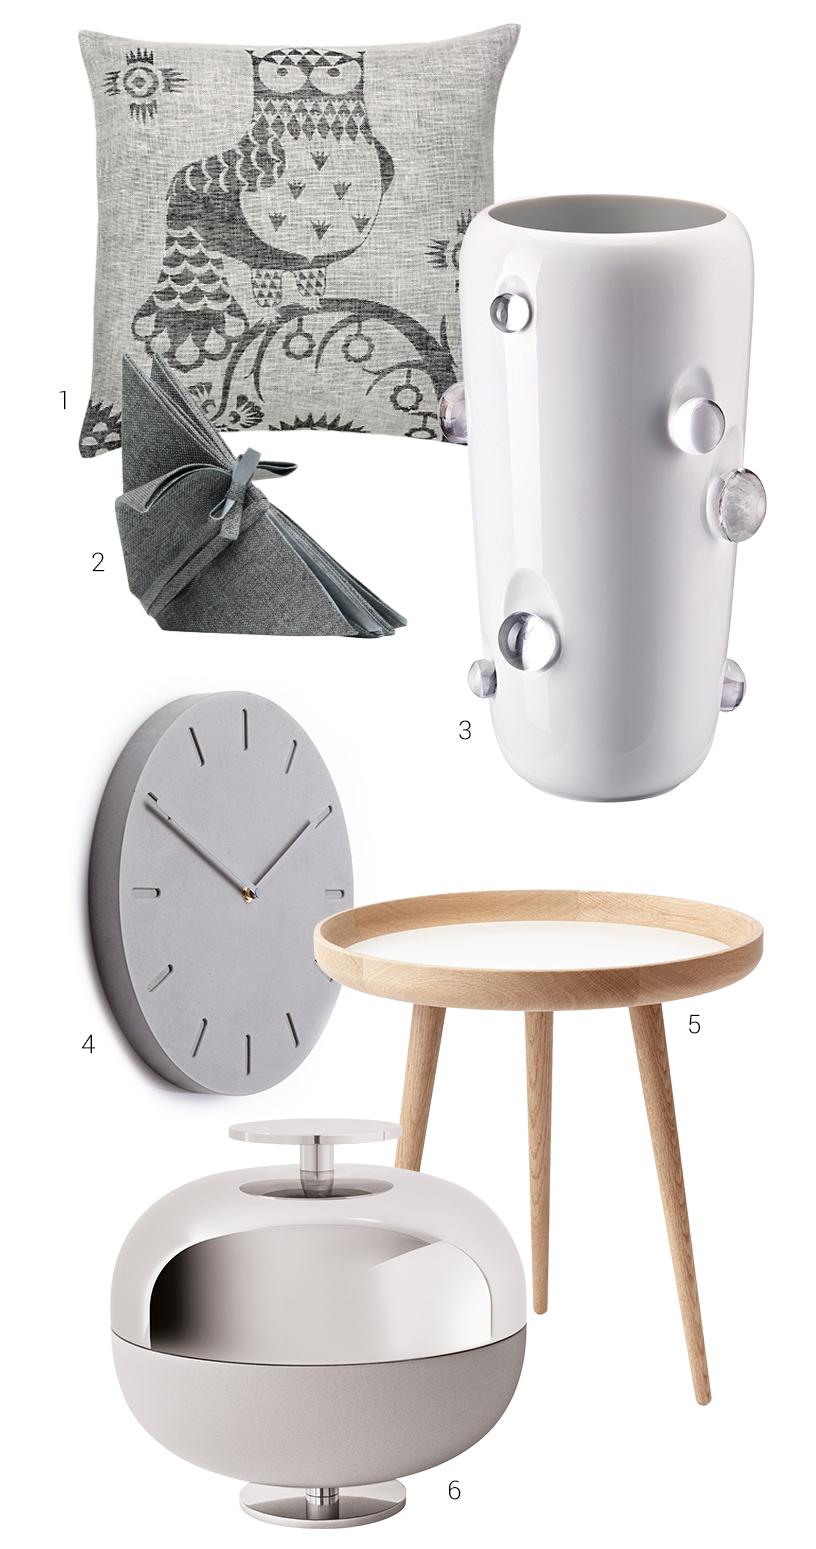 Iittala-Rosenthal-Applicata-Sambonet-Weiss-Grau-Interior Design-Beton-02